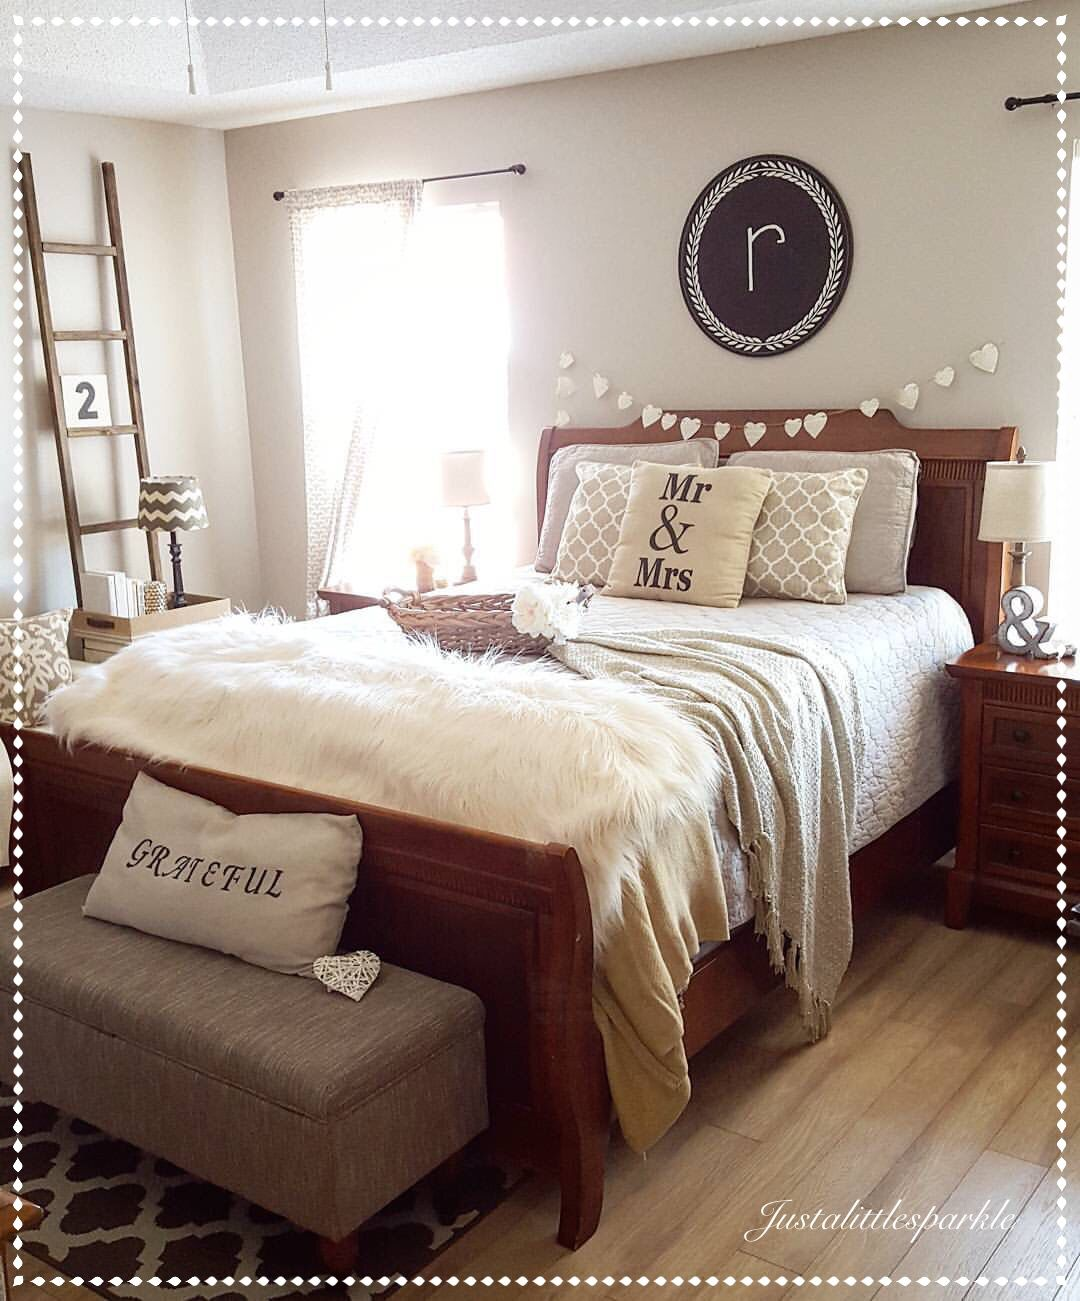 Cozy Master Bedroom Rustic Master Bedroom Rustic Master Bedroom